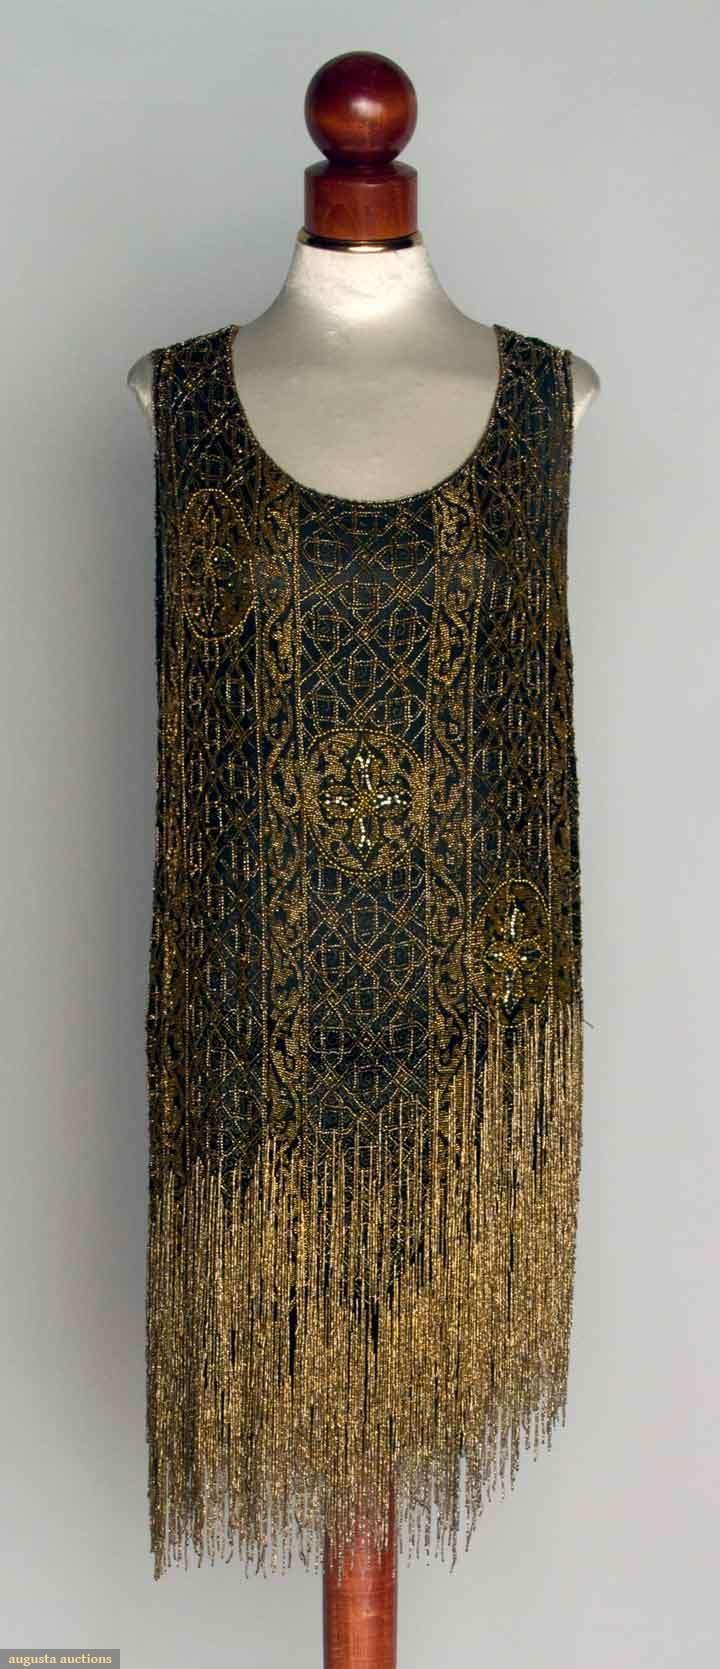 Gold beaded dress s black chiffon gold geometric lattice